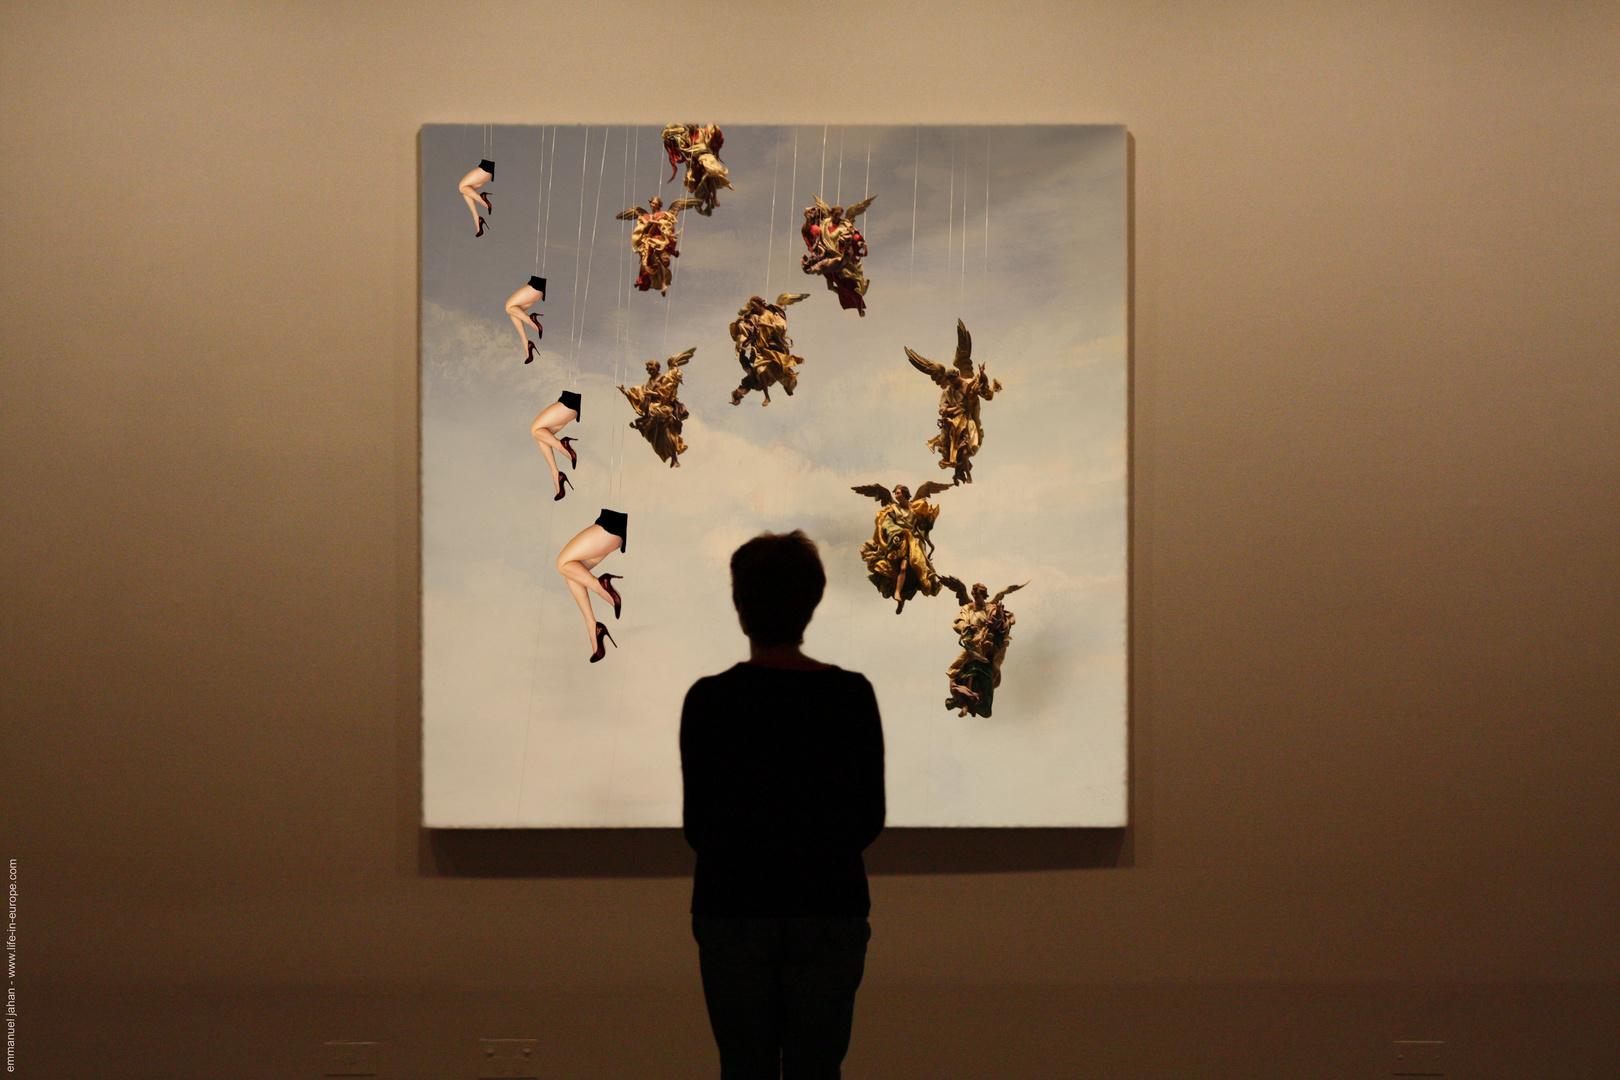 phantasm creation in the museum